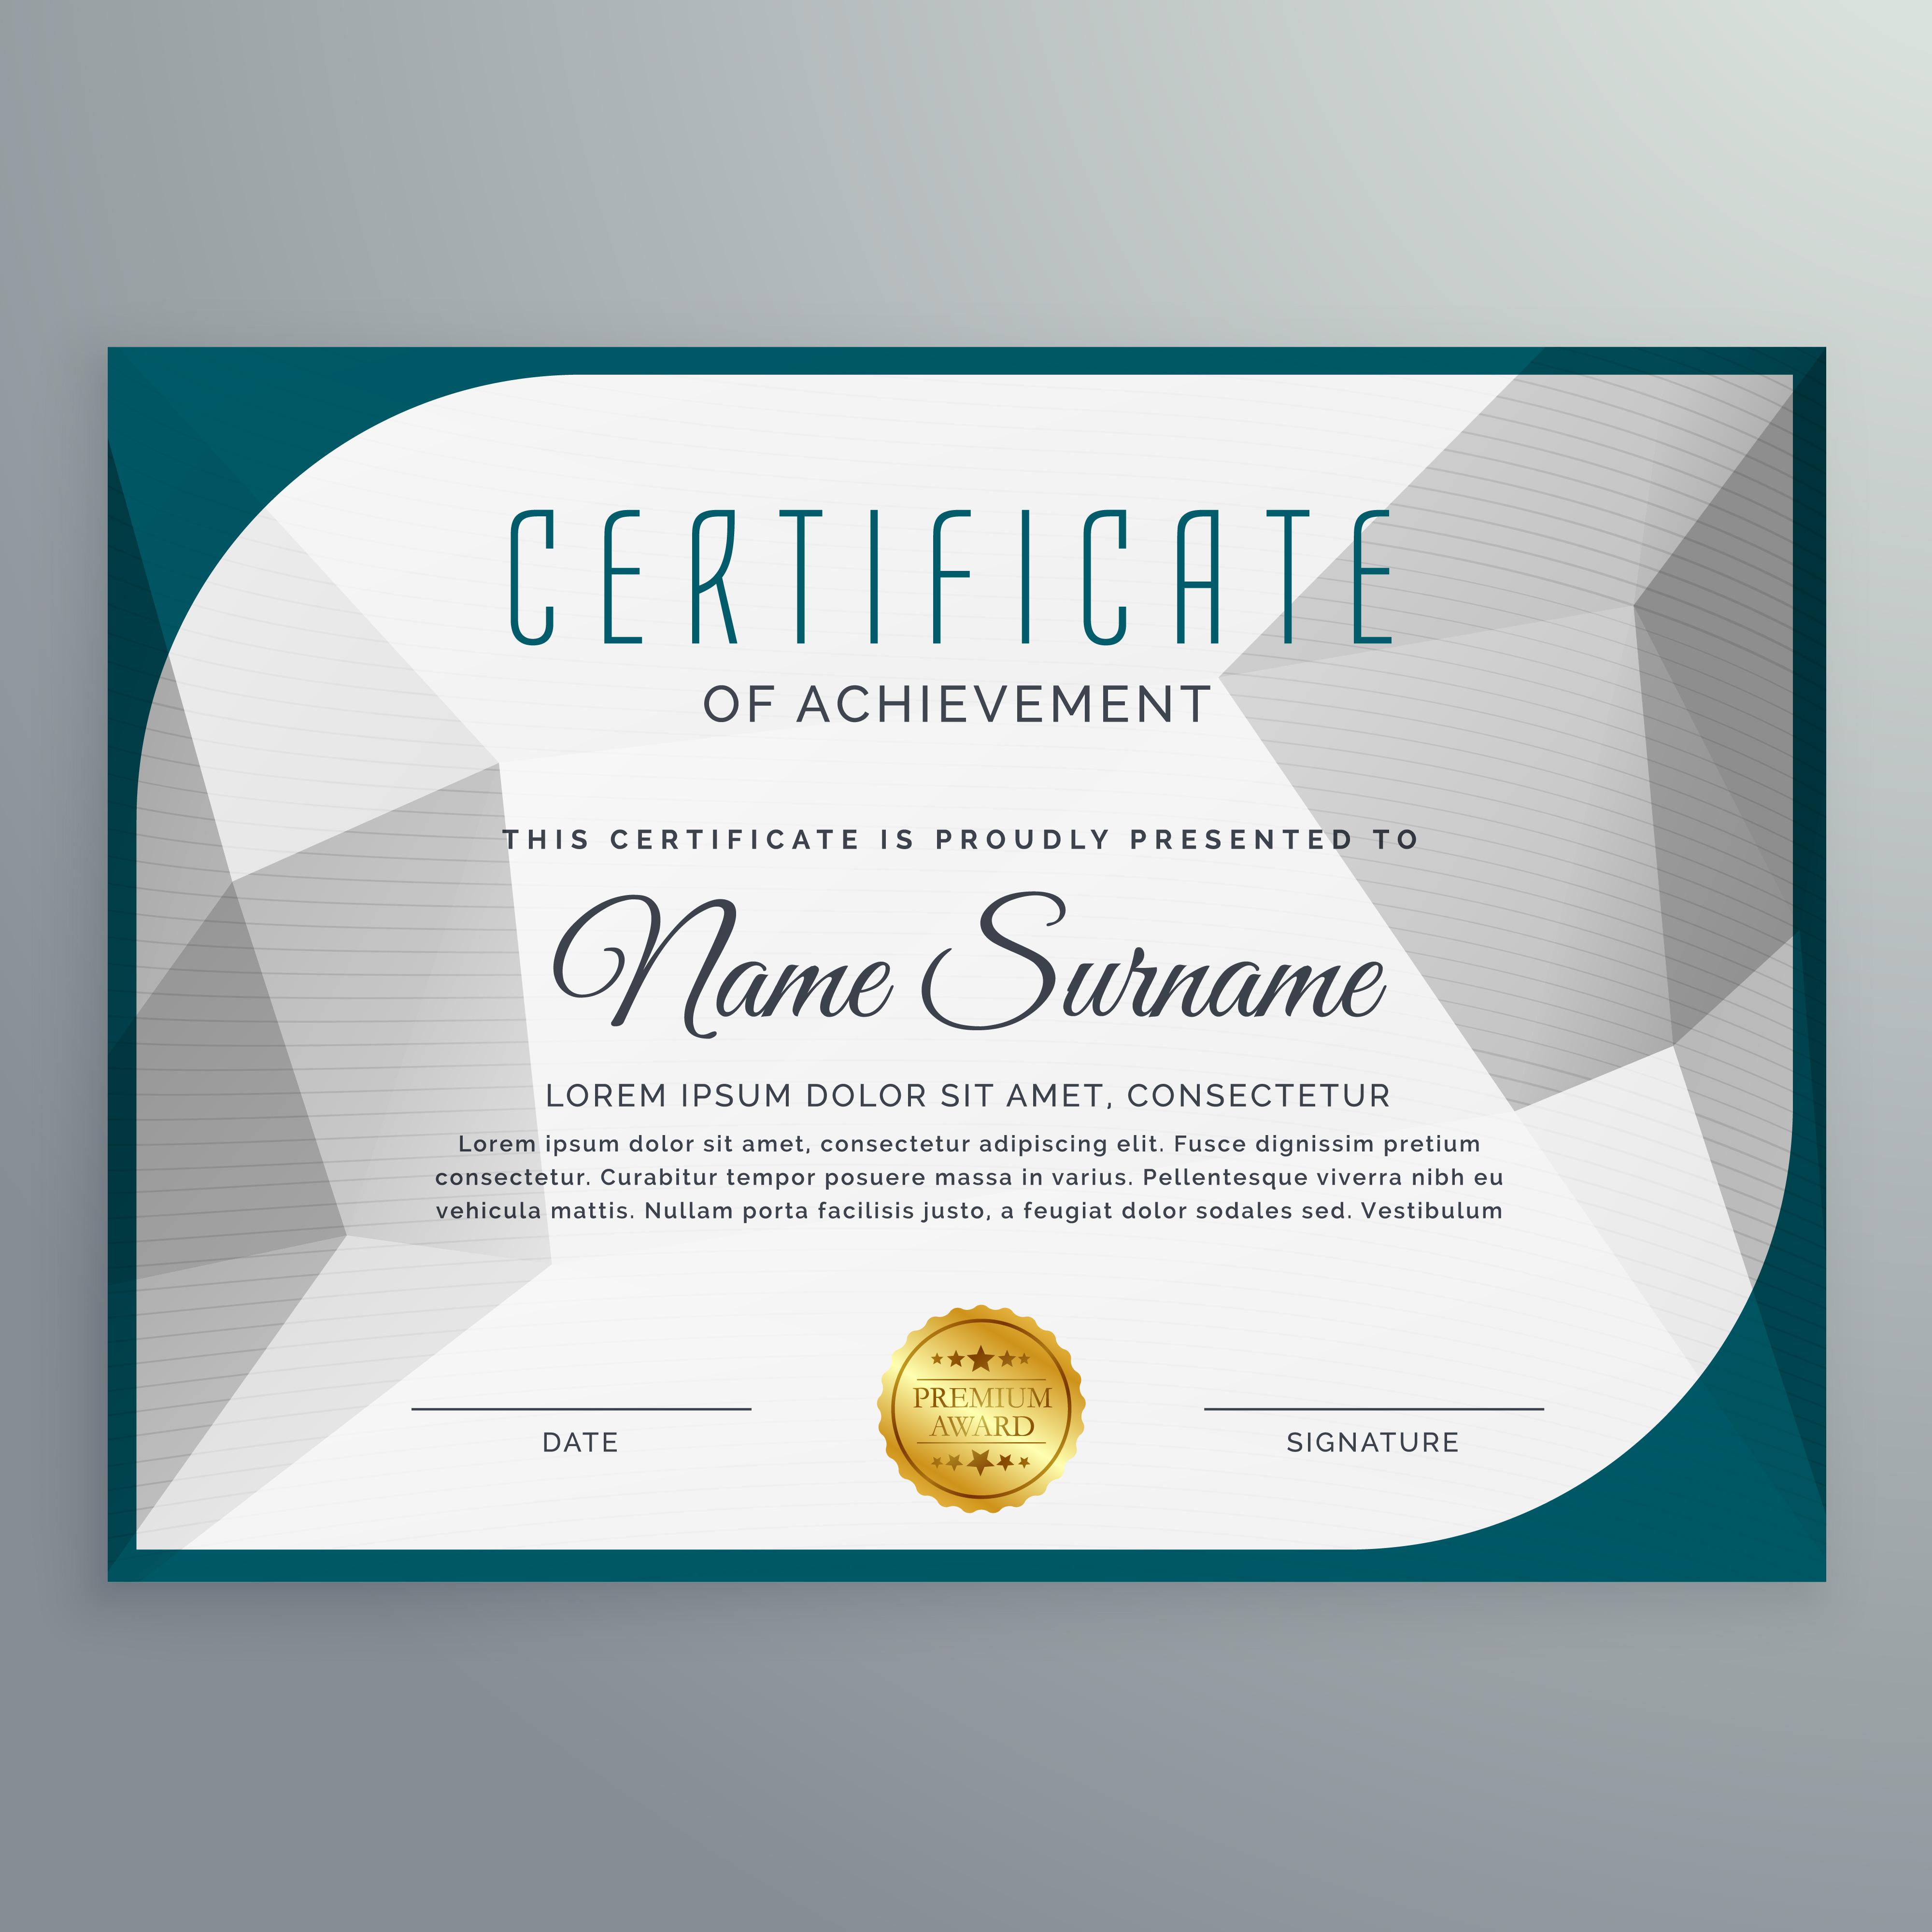 Creative simple certificate design template with abstract shape creative simple certificate design template with abstract shape download free vector art stock graphics images alramifo Images